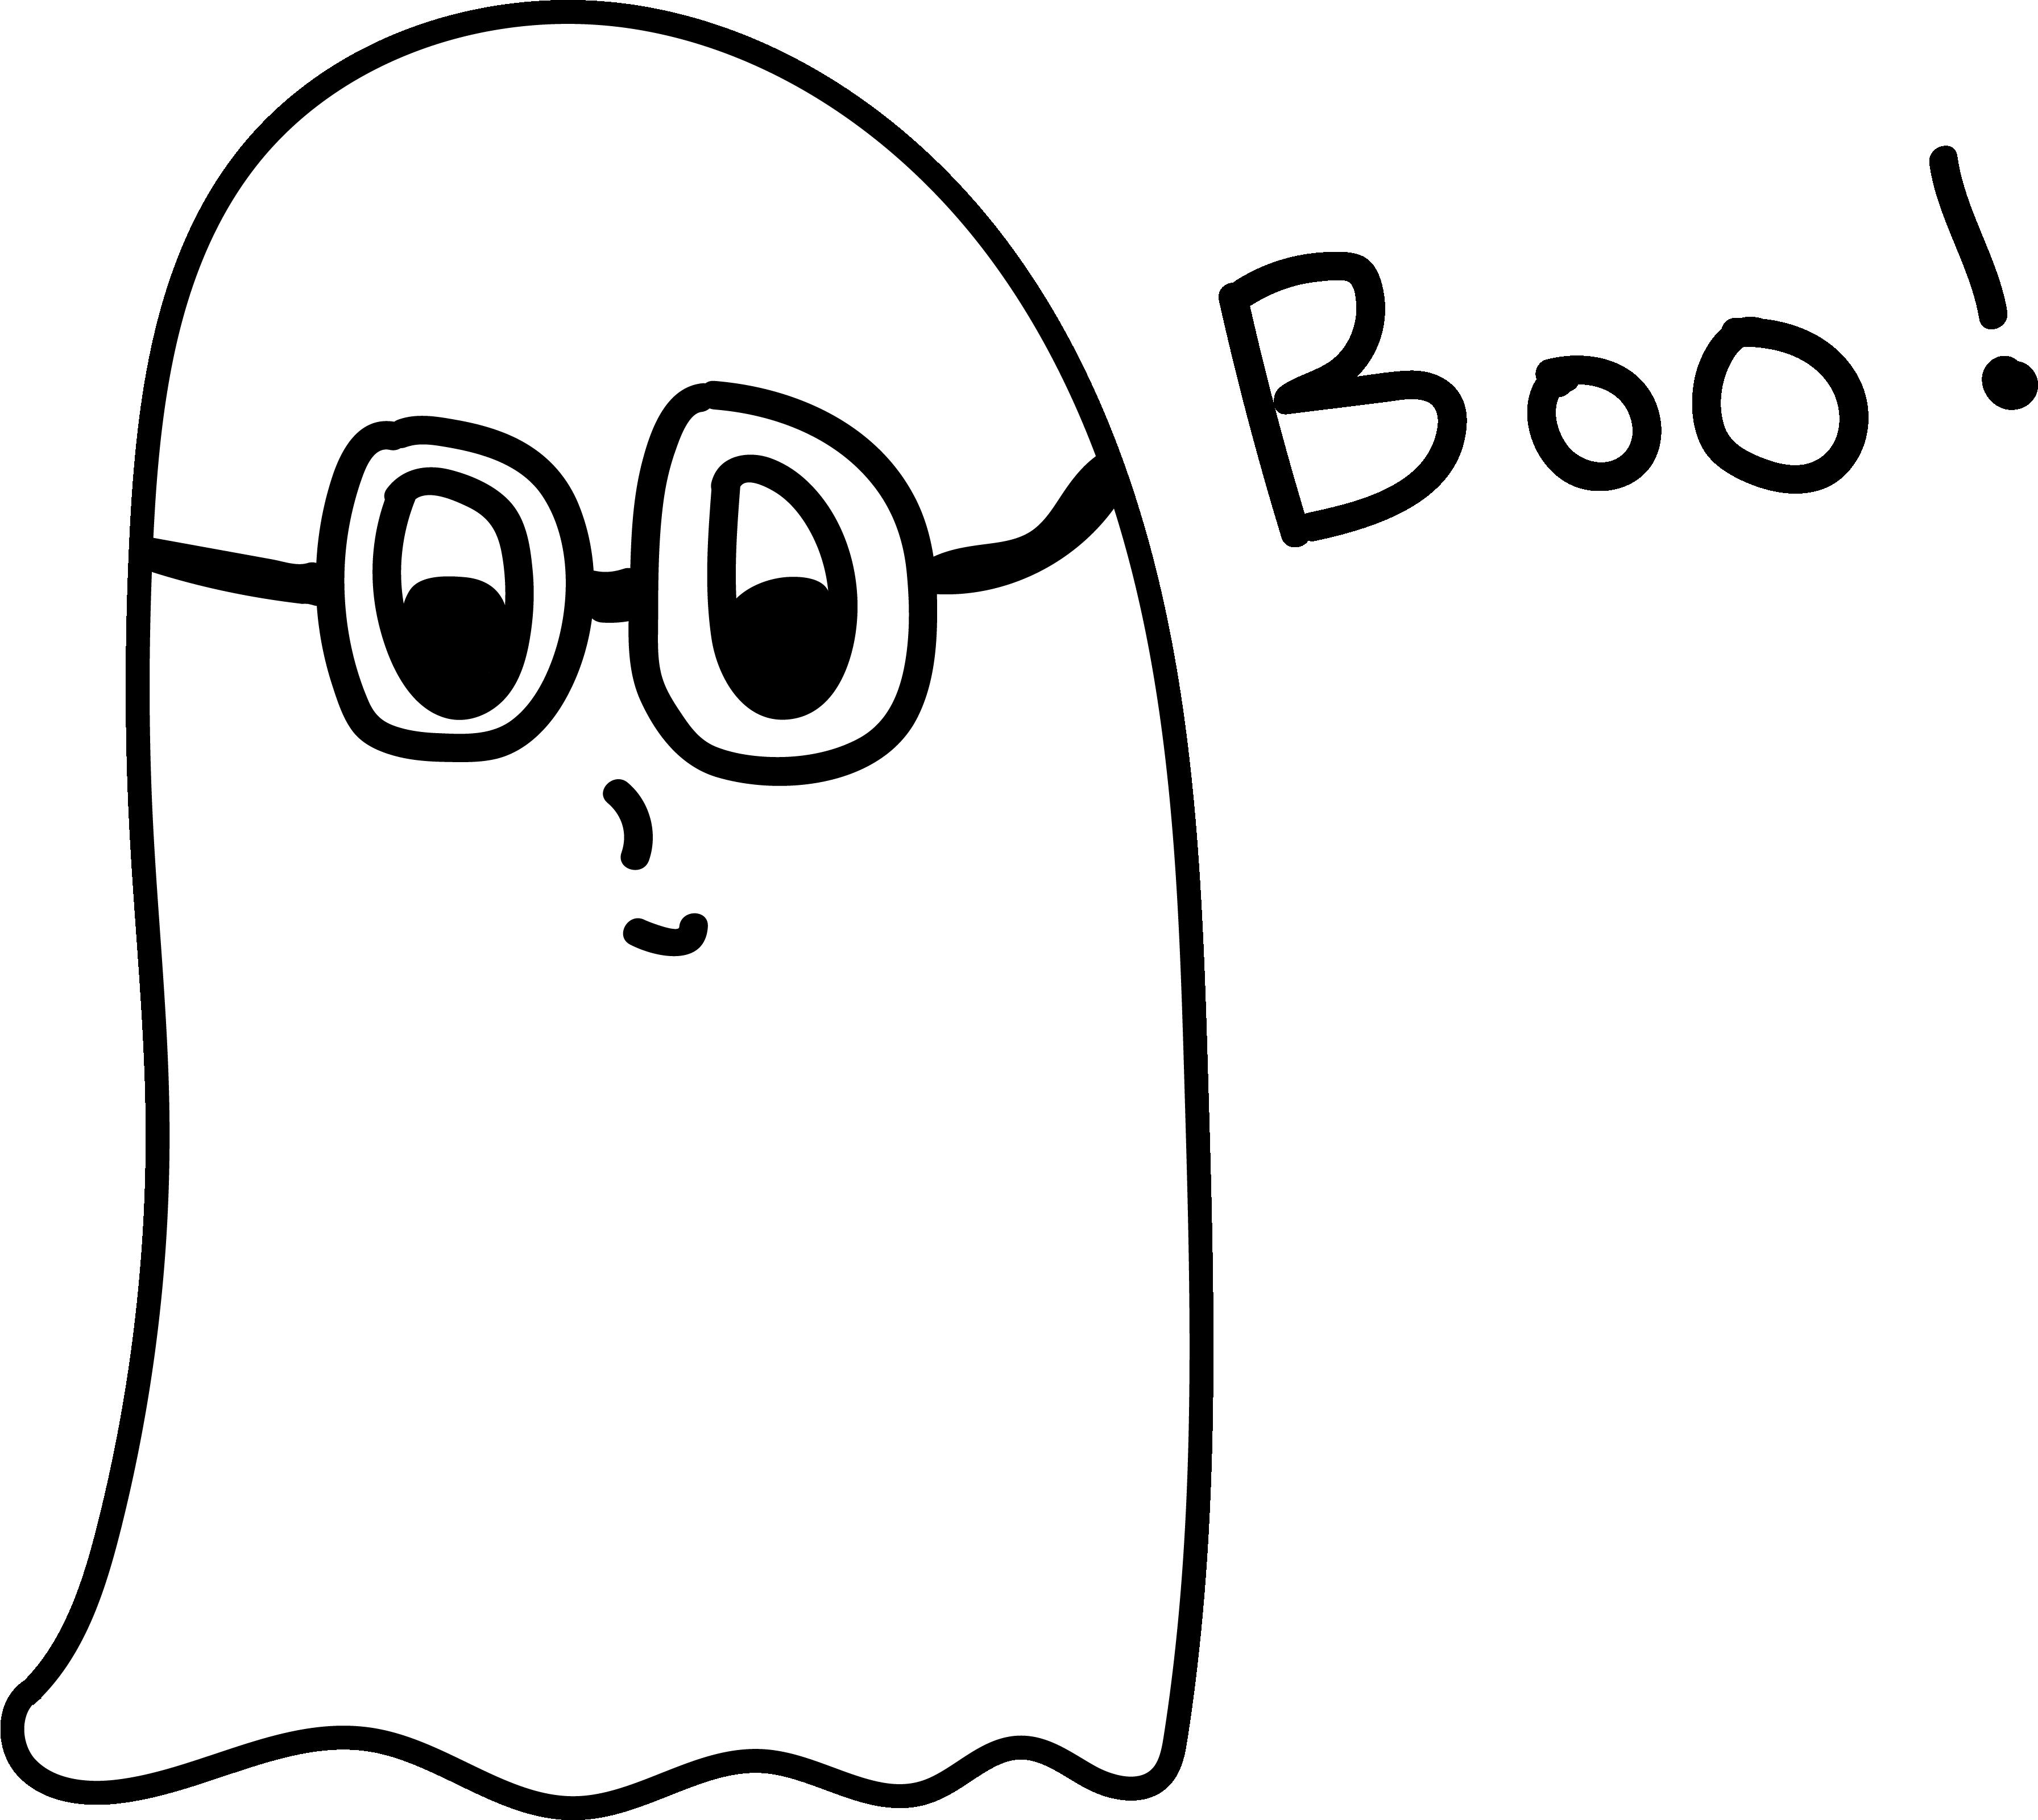 Ghost Doodle Ghost Cute Doodles Doodles